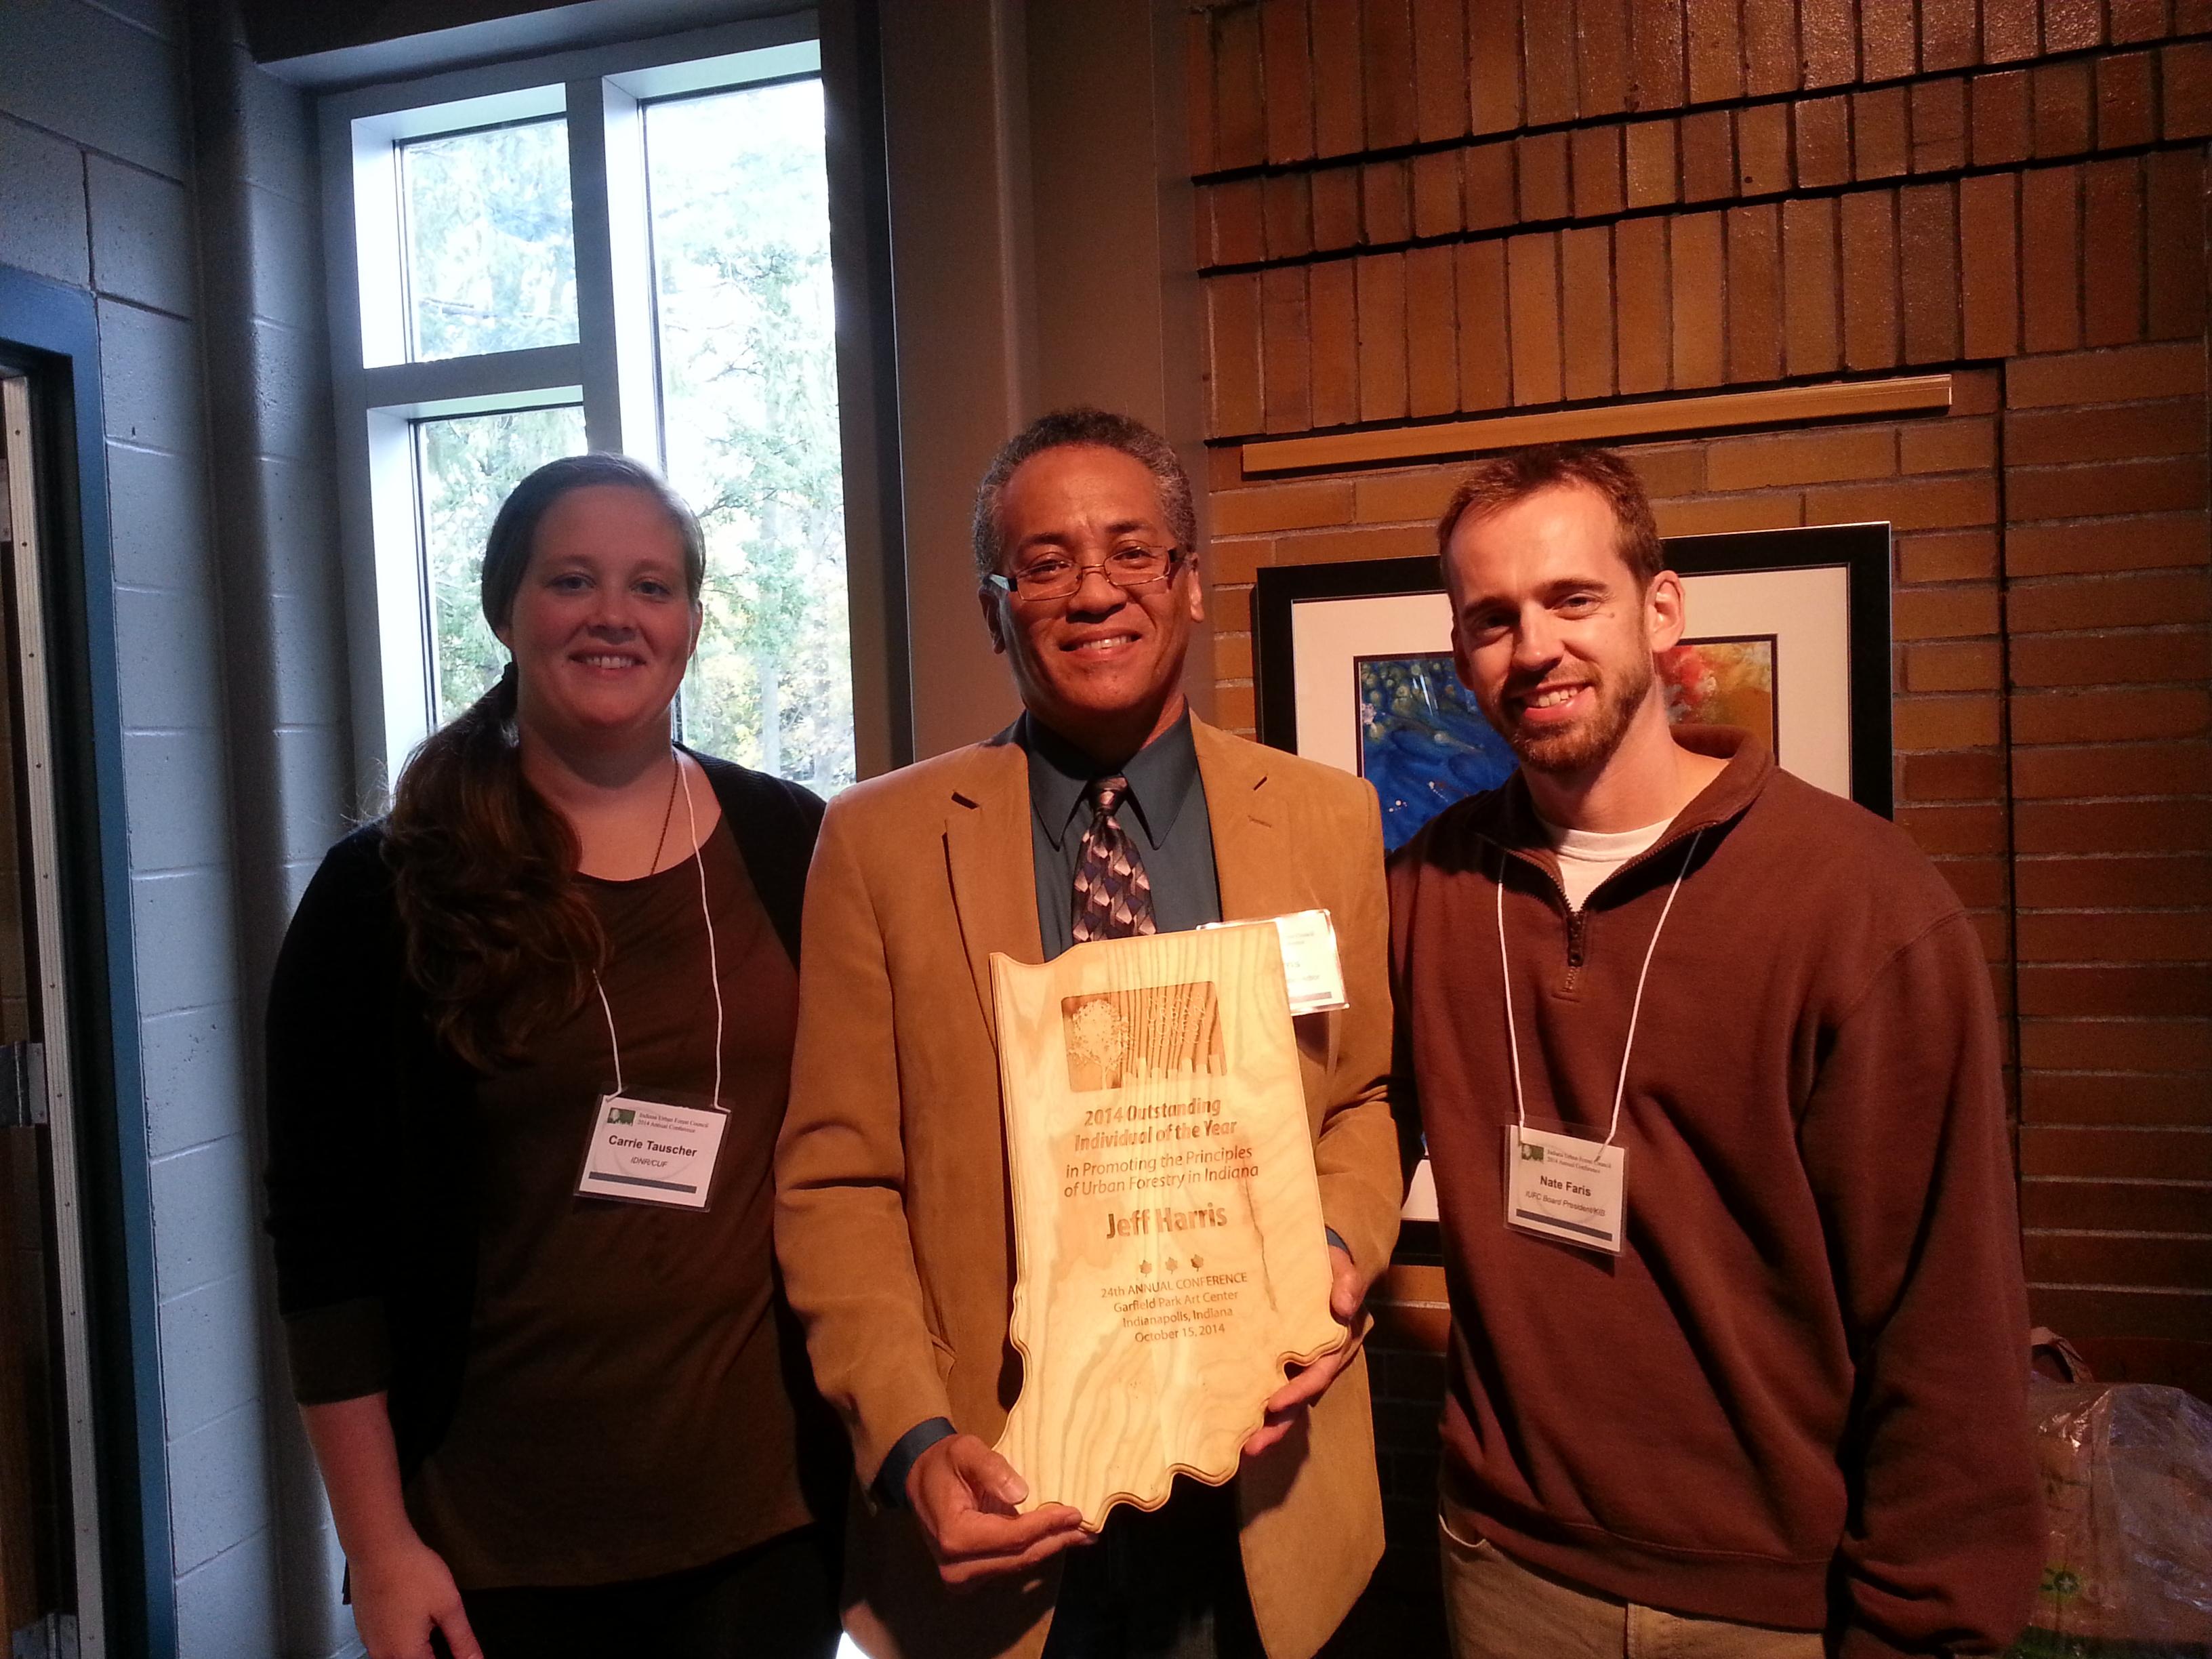 Jeff Harris Receives an Award